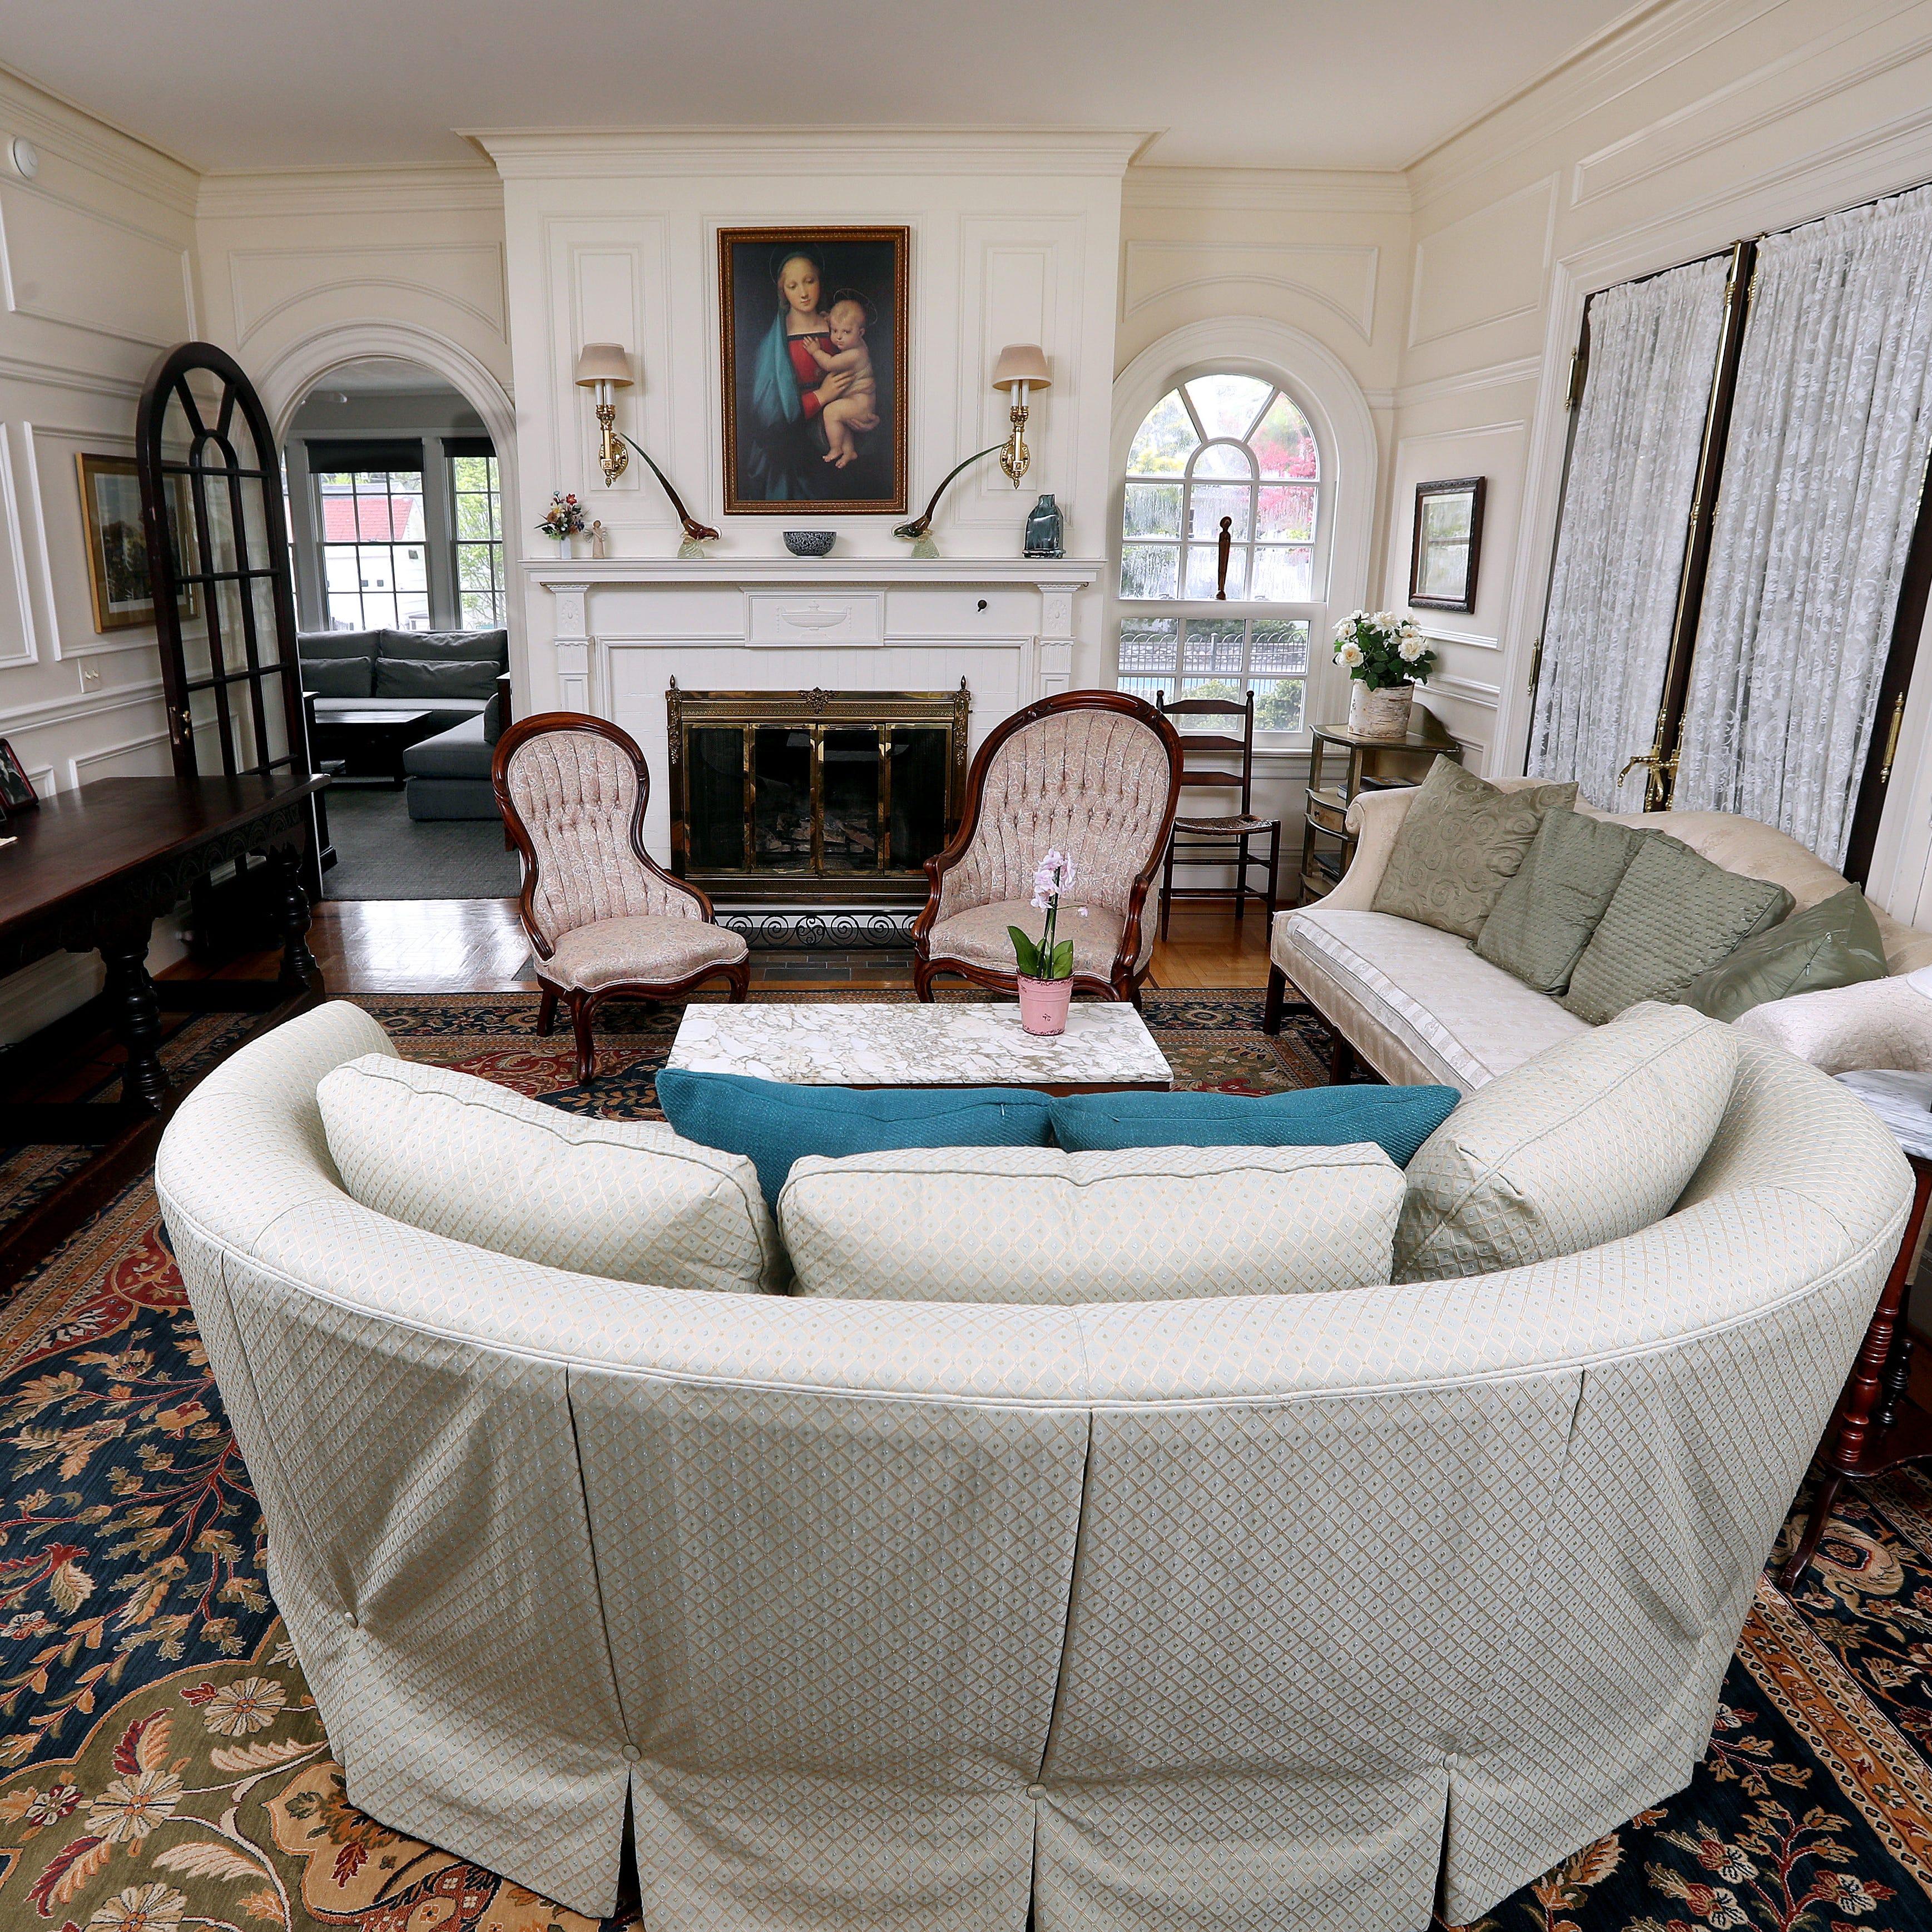 Historic Irondequoit mansion part of Landmark Society tour. Take a peek inside.